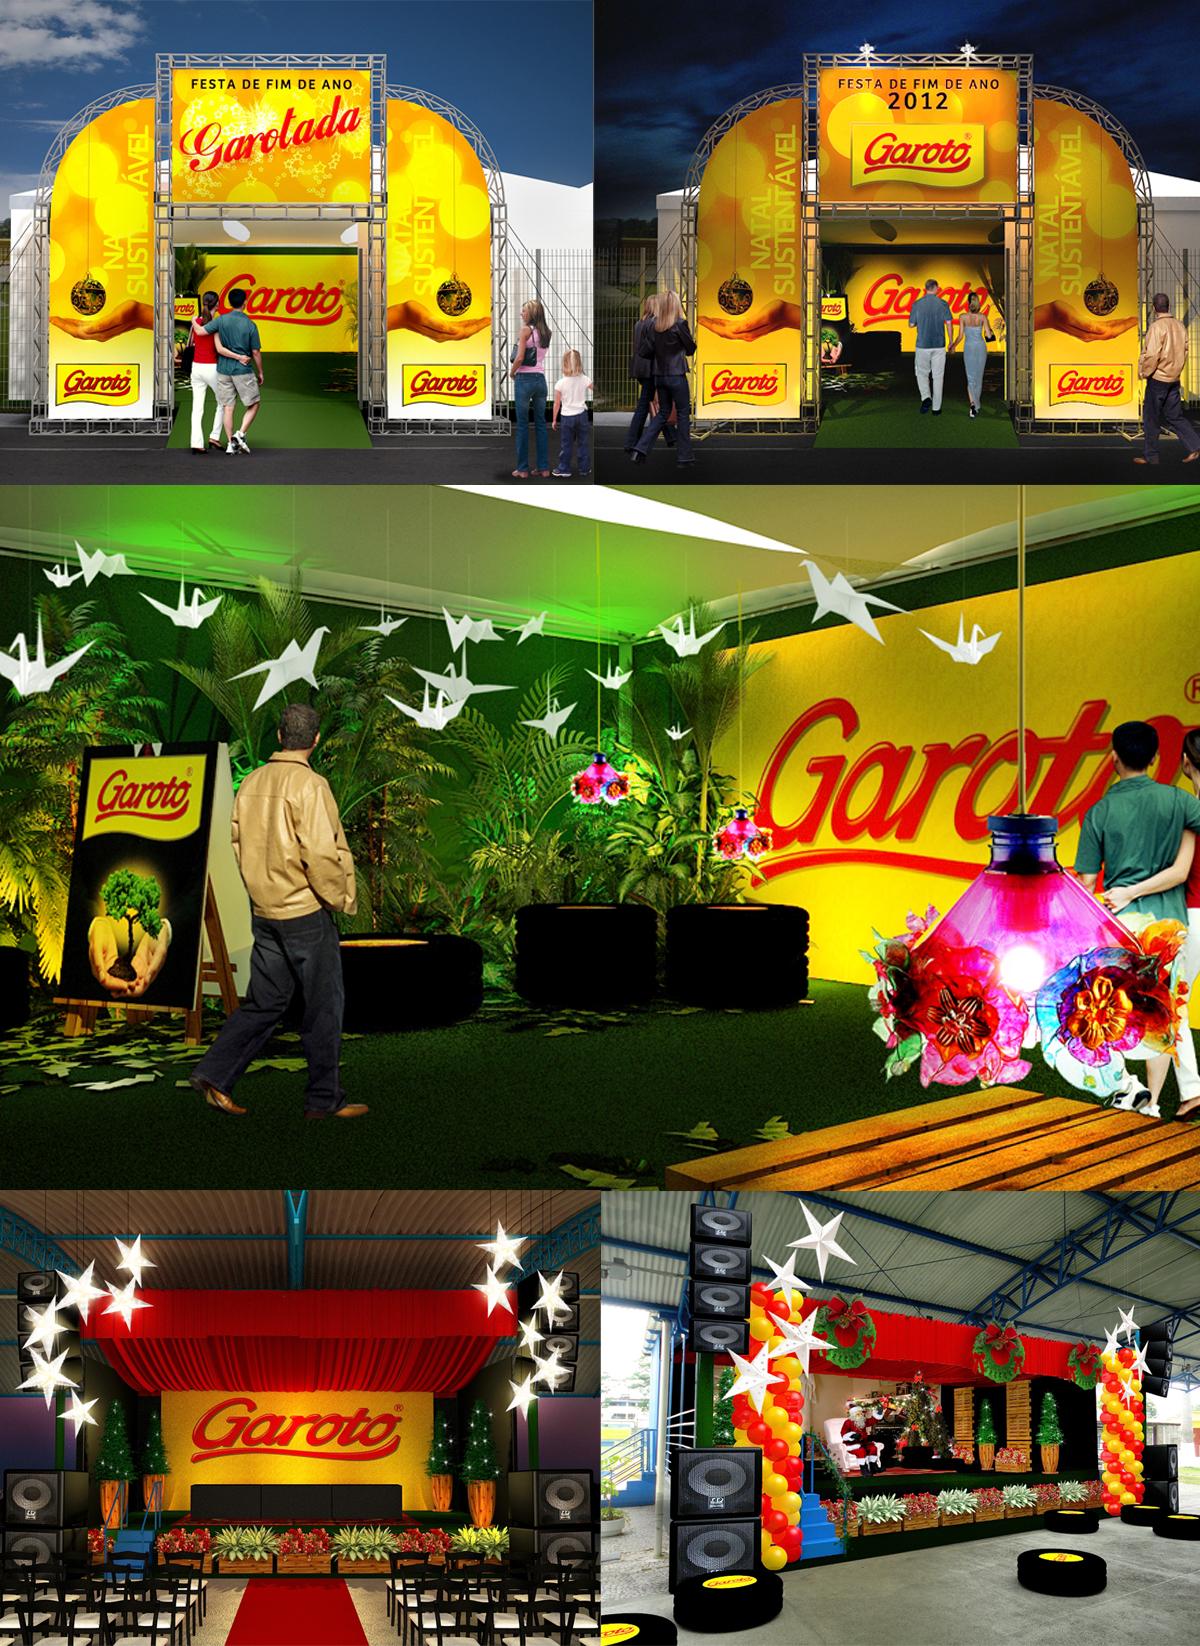 Garoto - Festa Anual 2012